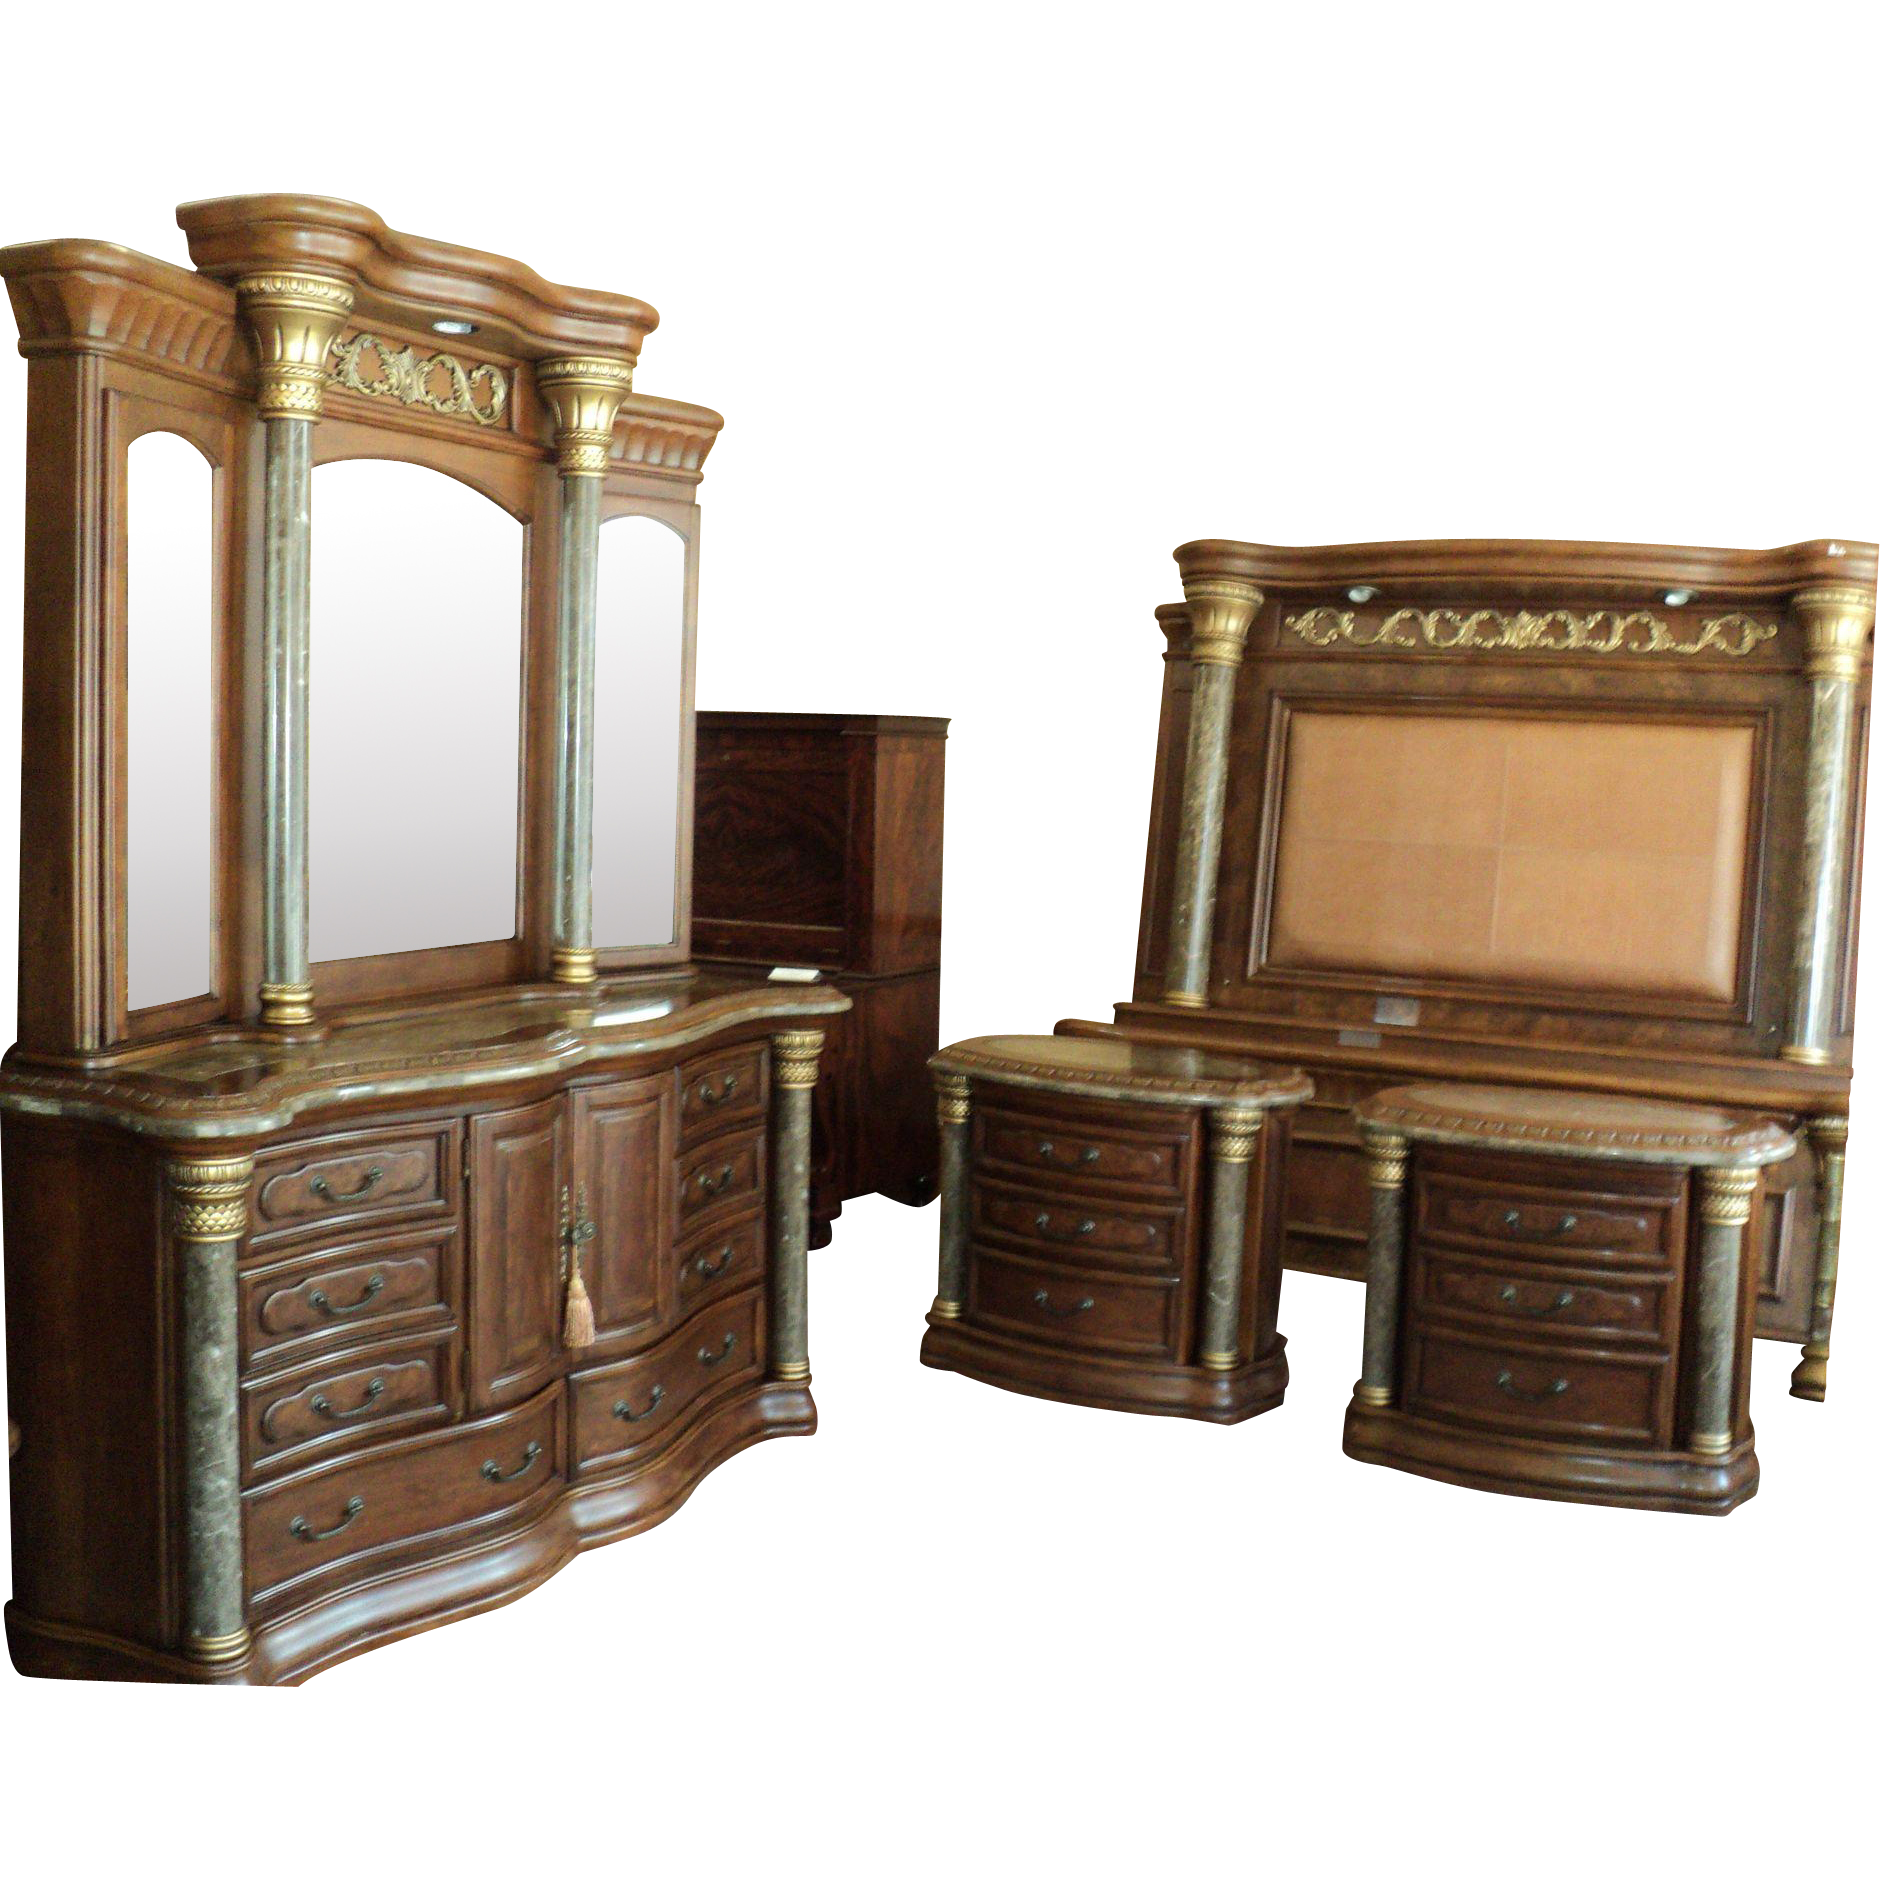 Michael Amini Bedroom Set Torino Collection By Aico From - Aico torino bedroom set